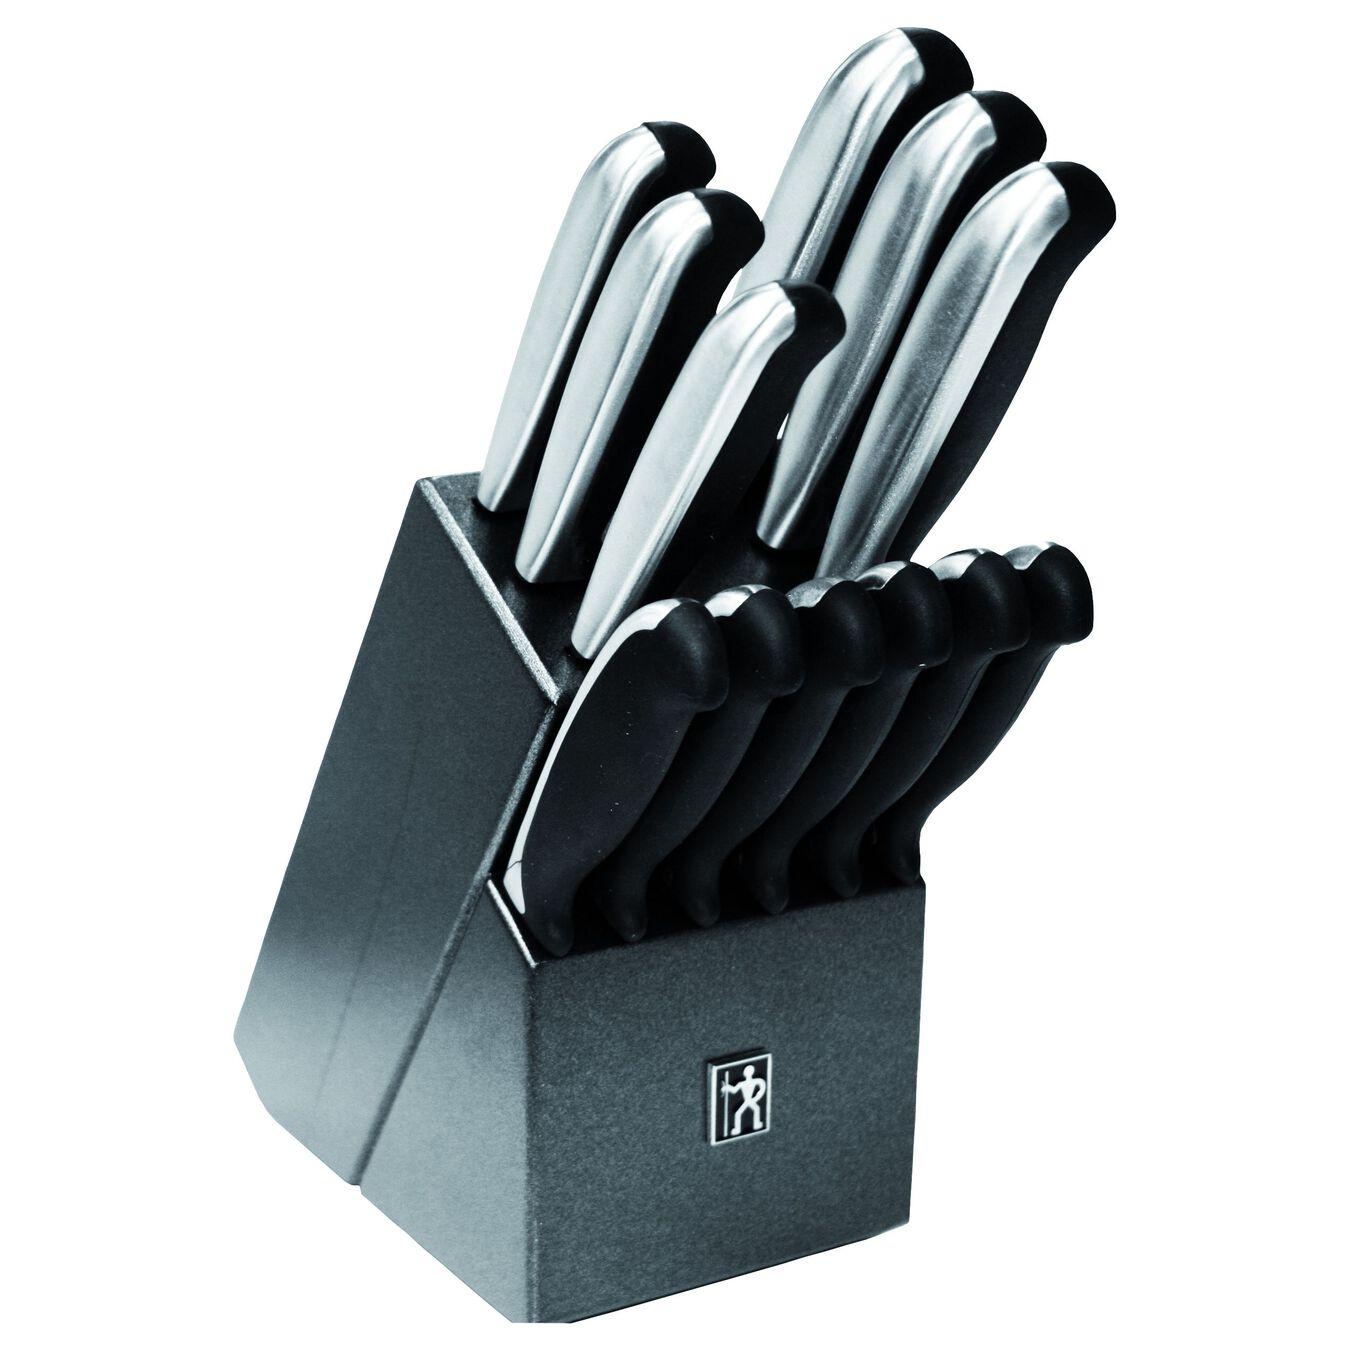 13-pc, Knife block set,,large 1